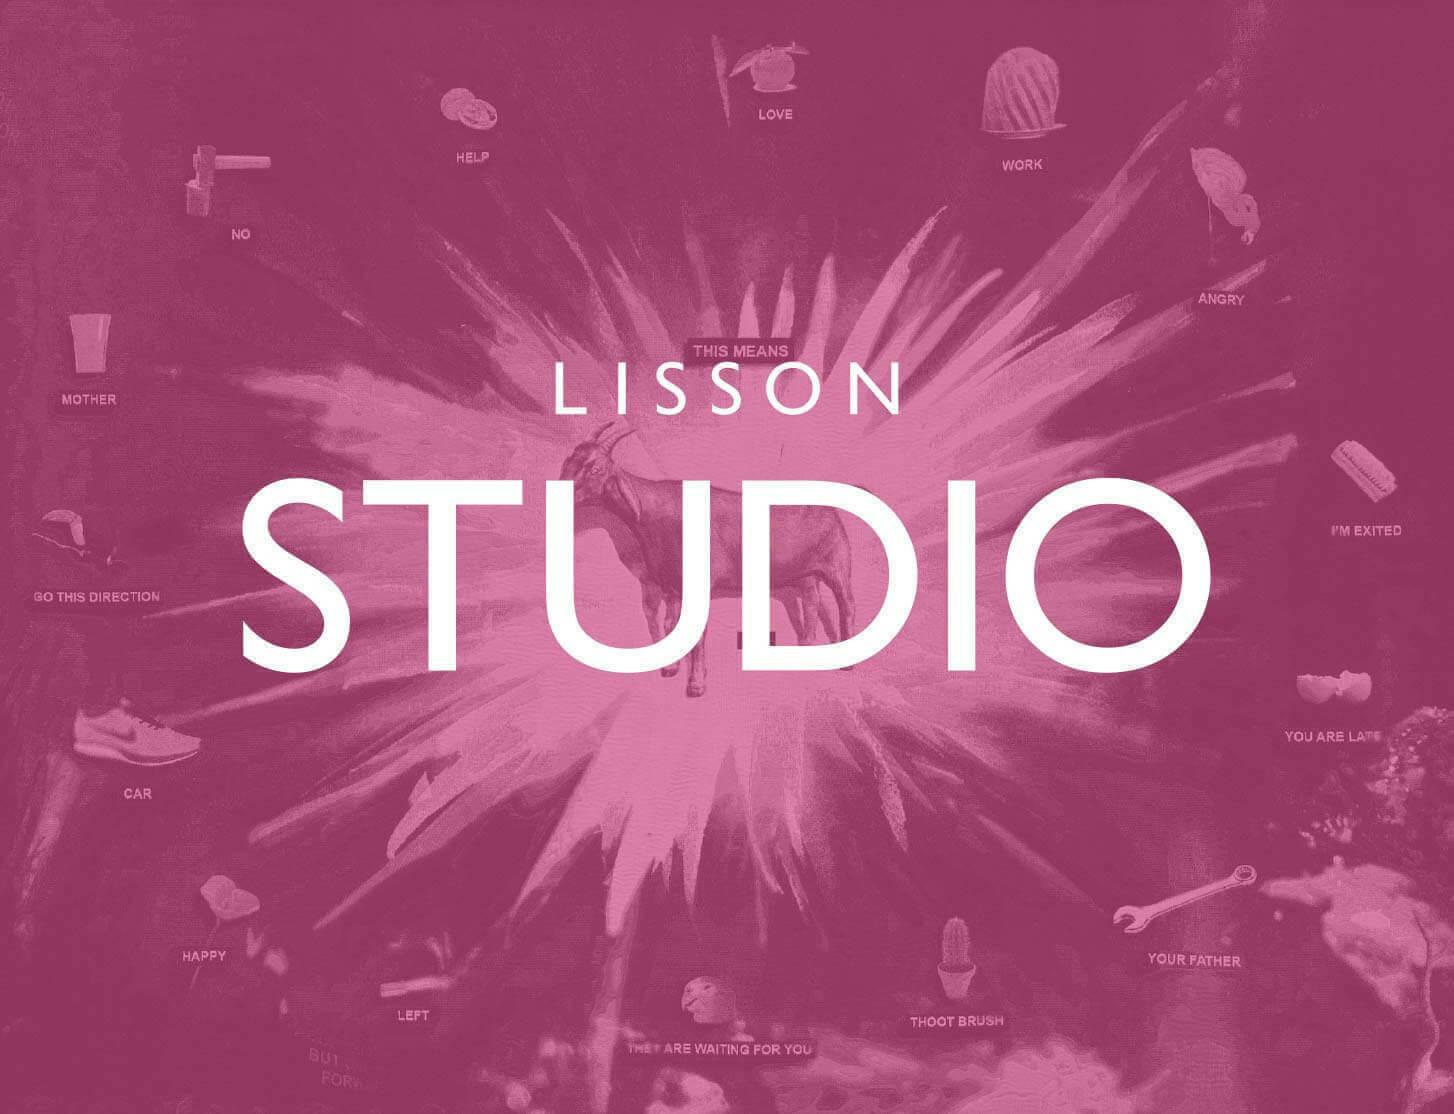 Lisson Studio: Learning Laure Prouvost's lexicon